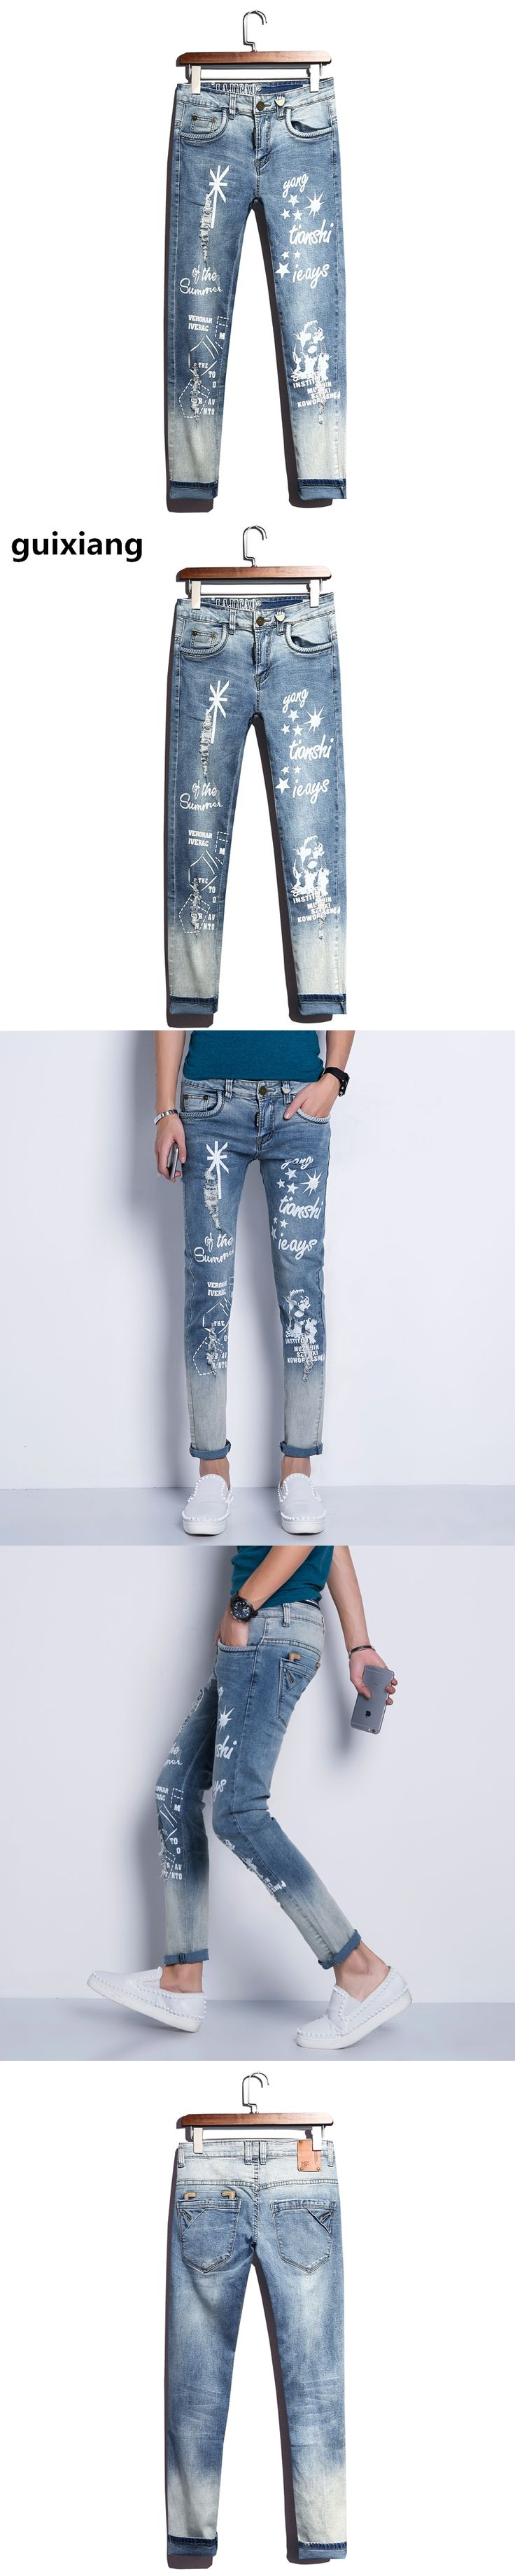 Men's jeans men leisure printed jeans men's high quality classic broken hole design jeans men Free shipping